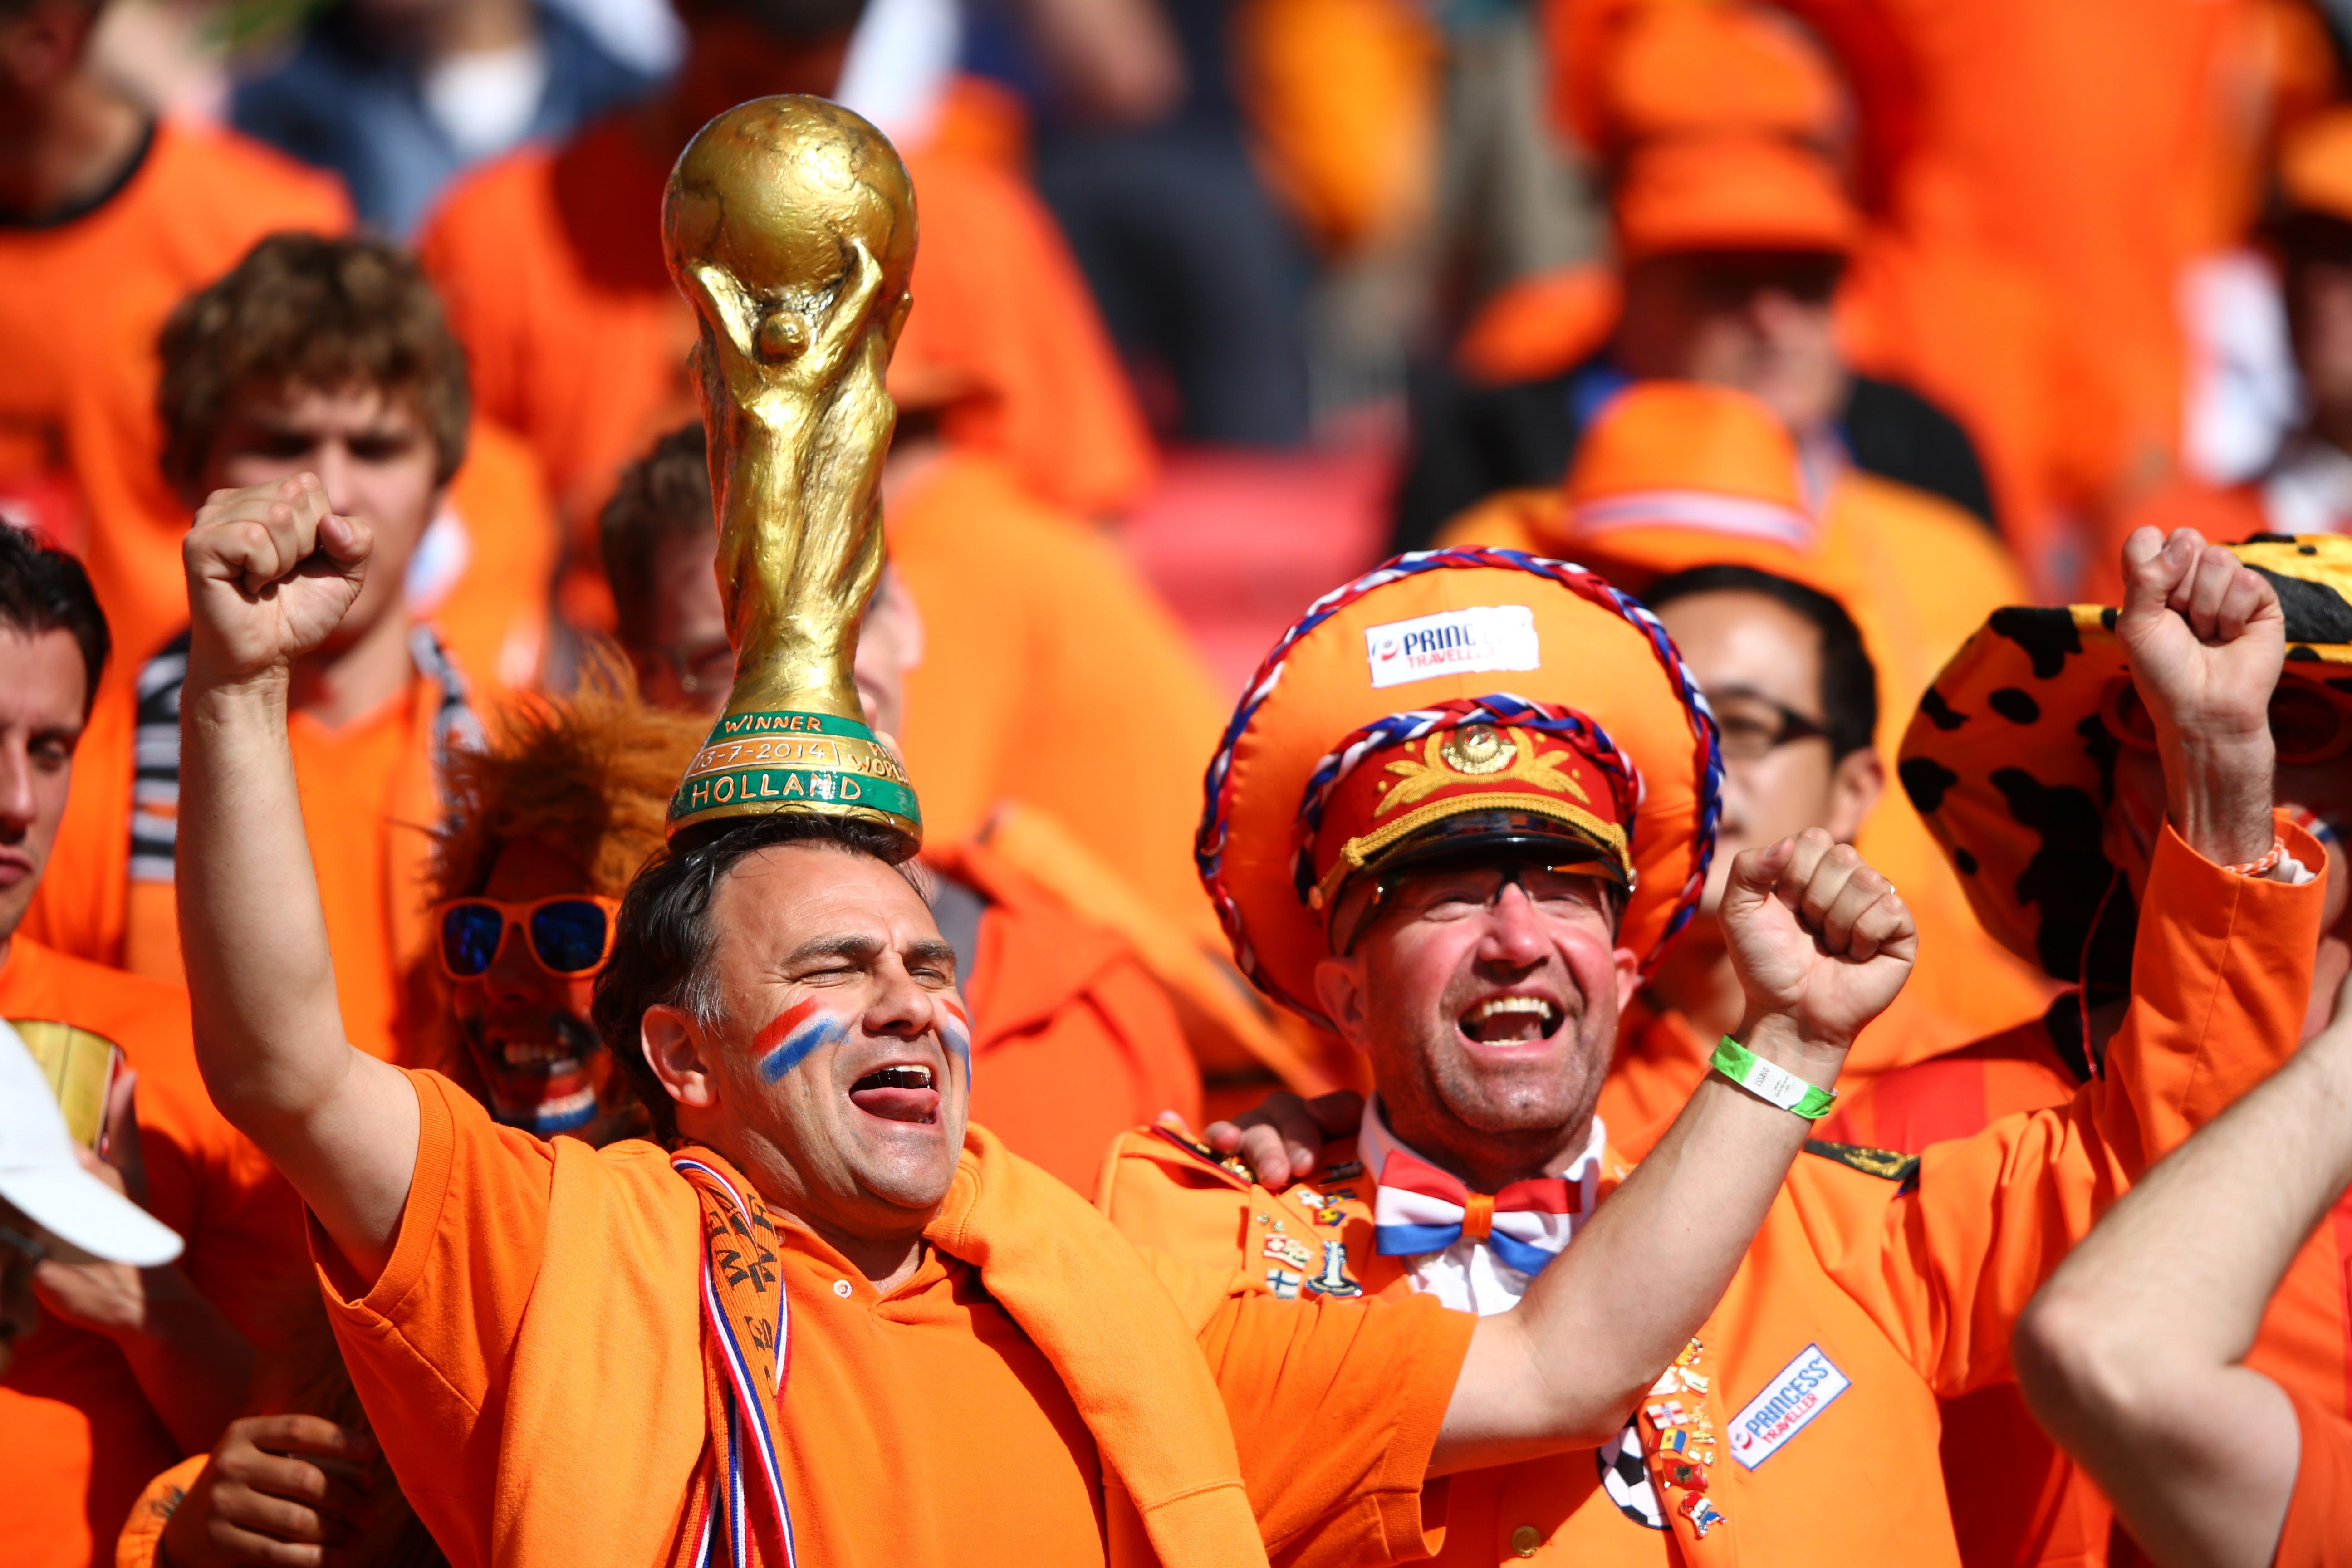 2014 World Cup Photos - Australia v Netherlands: Group B - 2014 FIFA World Cup Brazil | World Cup